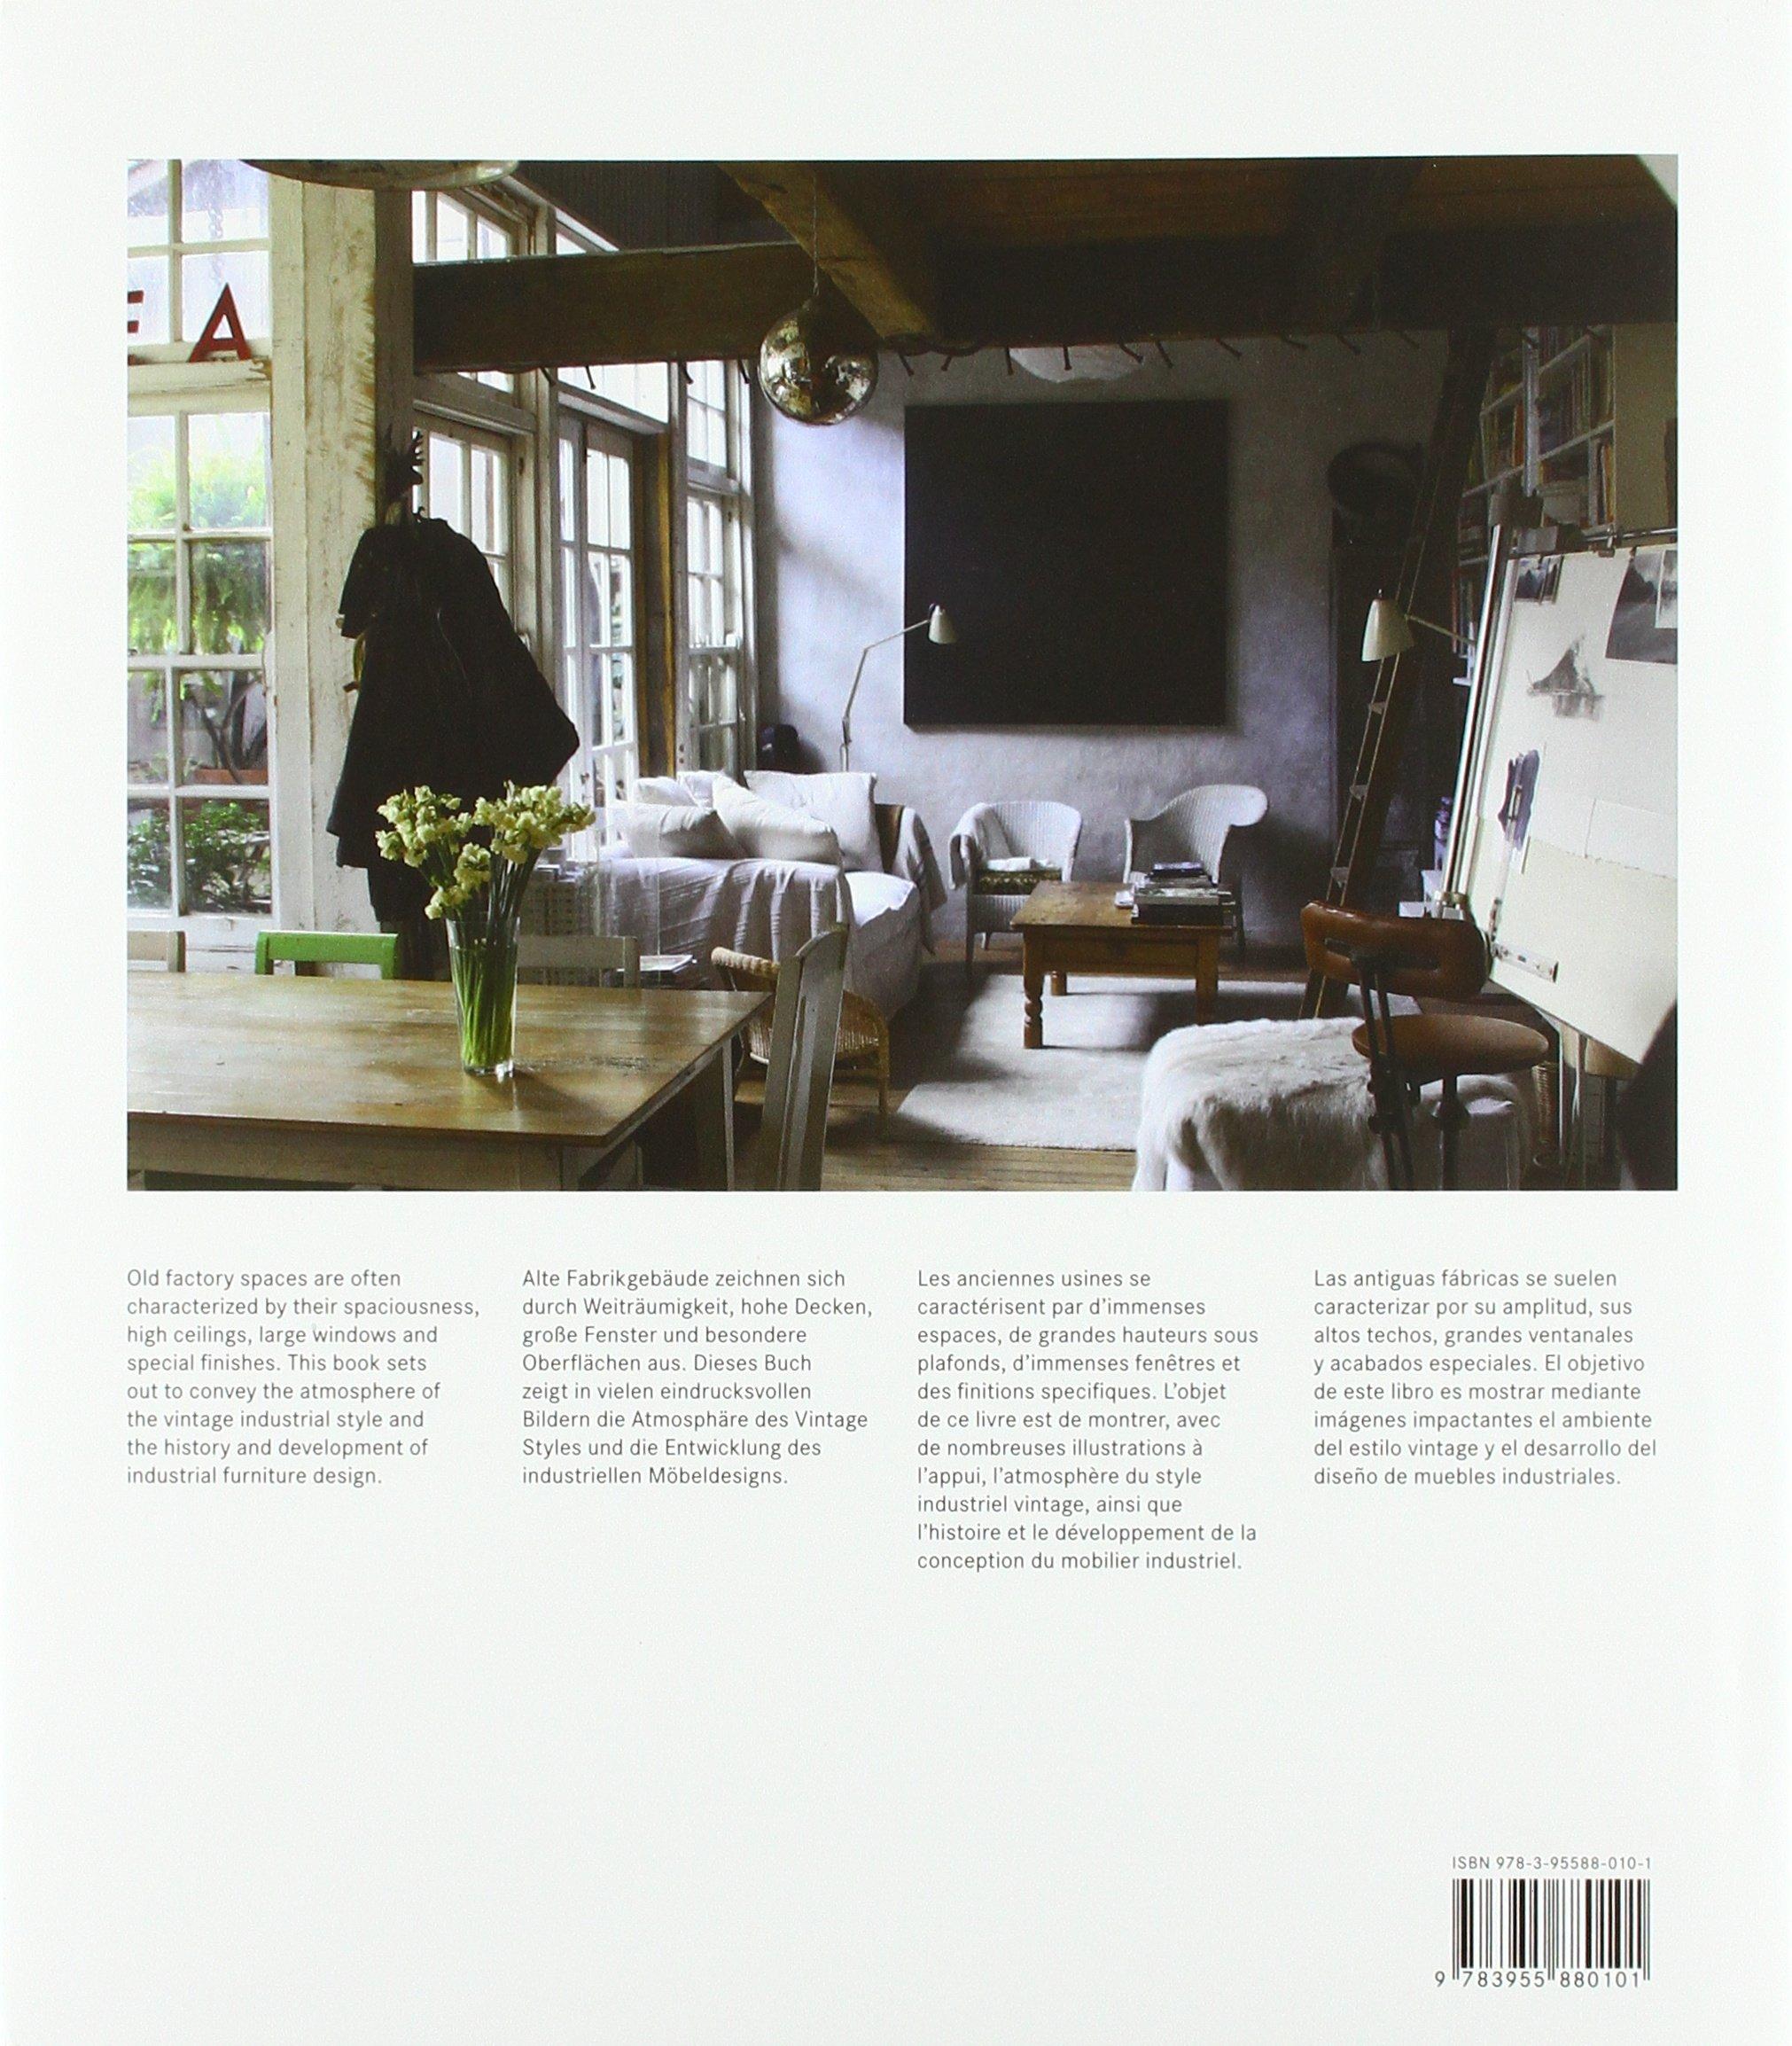 Vintage Industrial Interiors Contemporary Architecture Interiors Martinez Alonso Claudia 9783955880101 Amazon Com Books